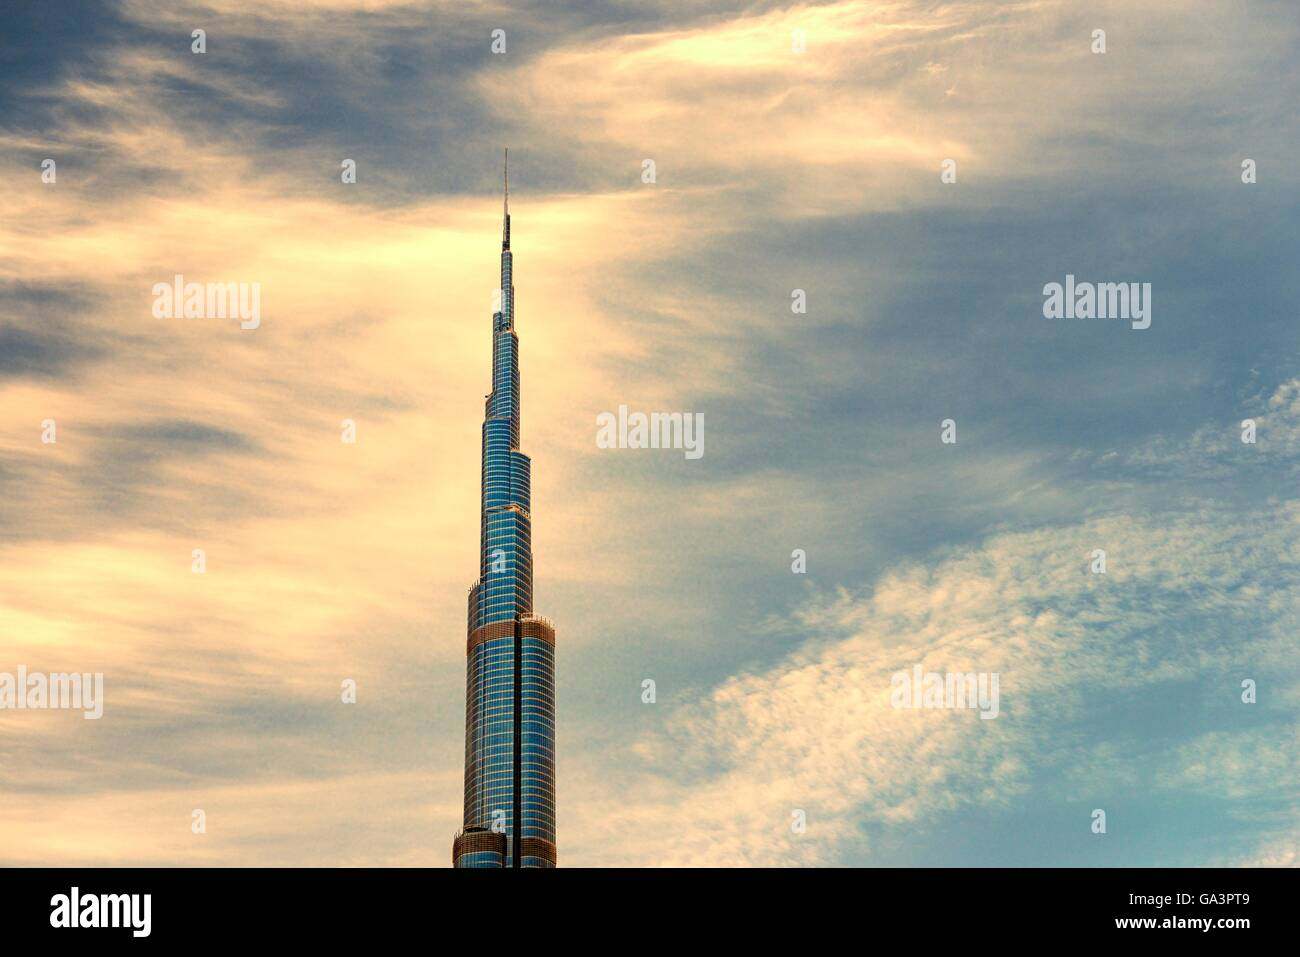 El Burj Khalifa aka, la torre Burj Dubai. ciudad de Dubai, Emiratos Árabes Unidos. edificio más alto del Imagen De Stock